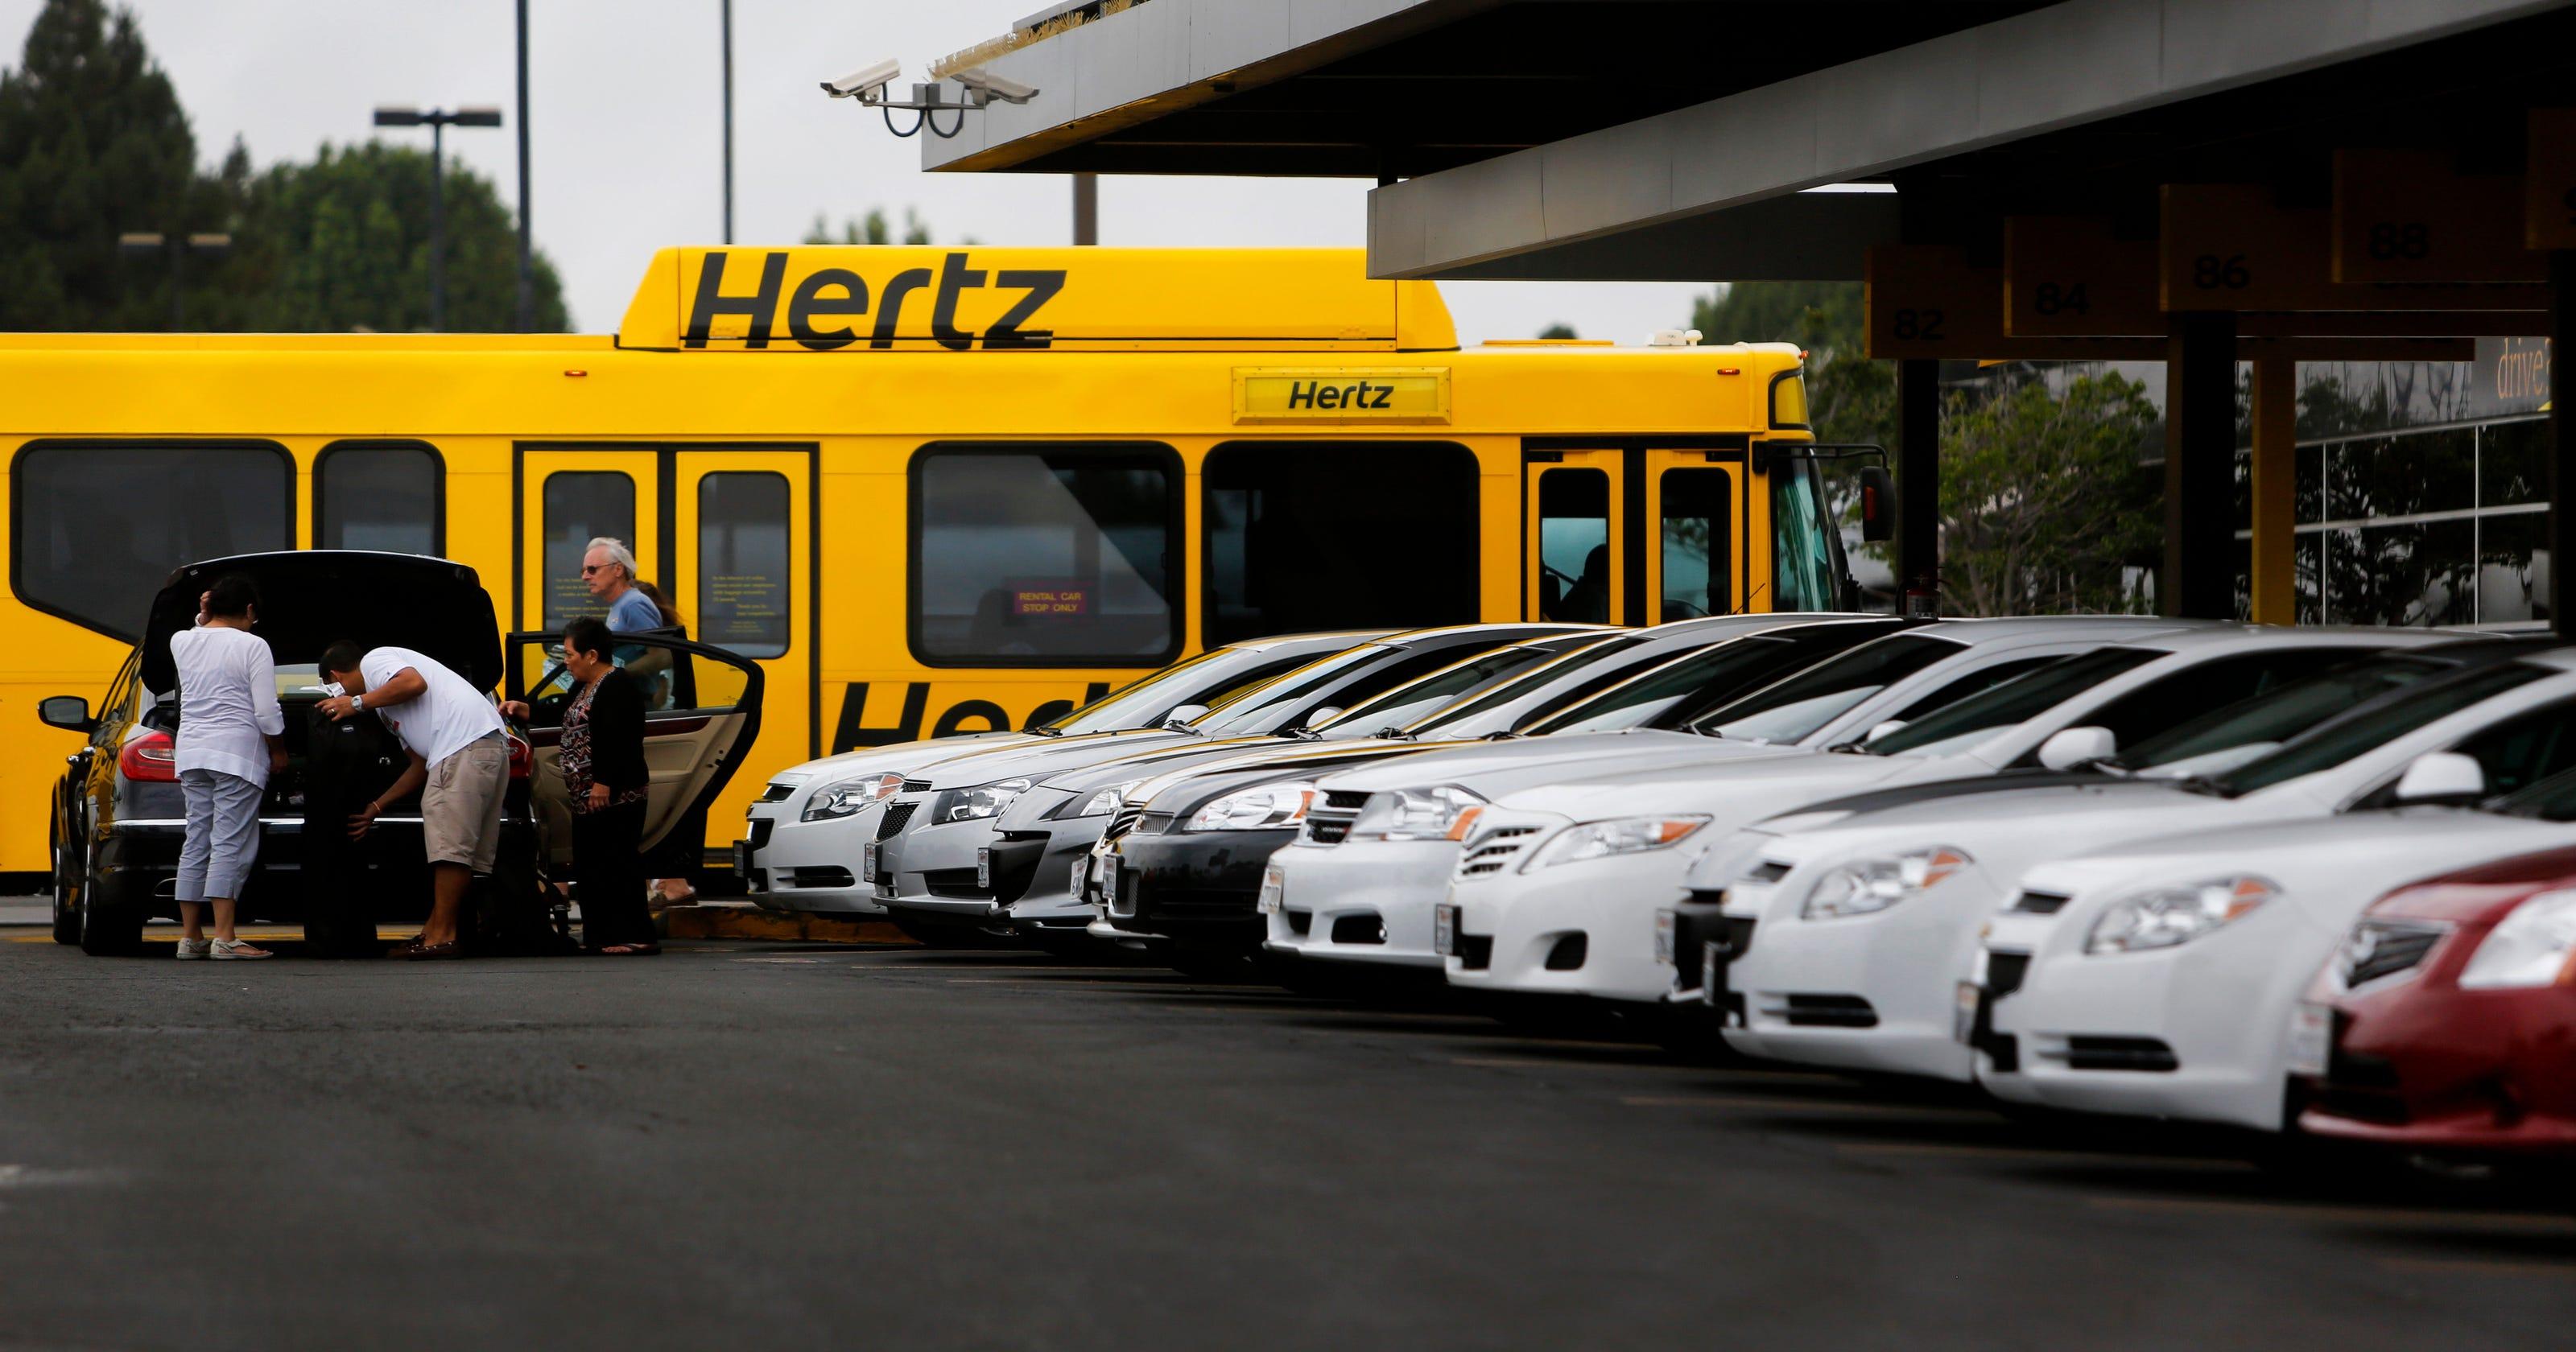 Rental Car Companies Court Customers On Social Media